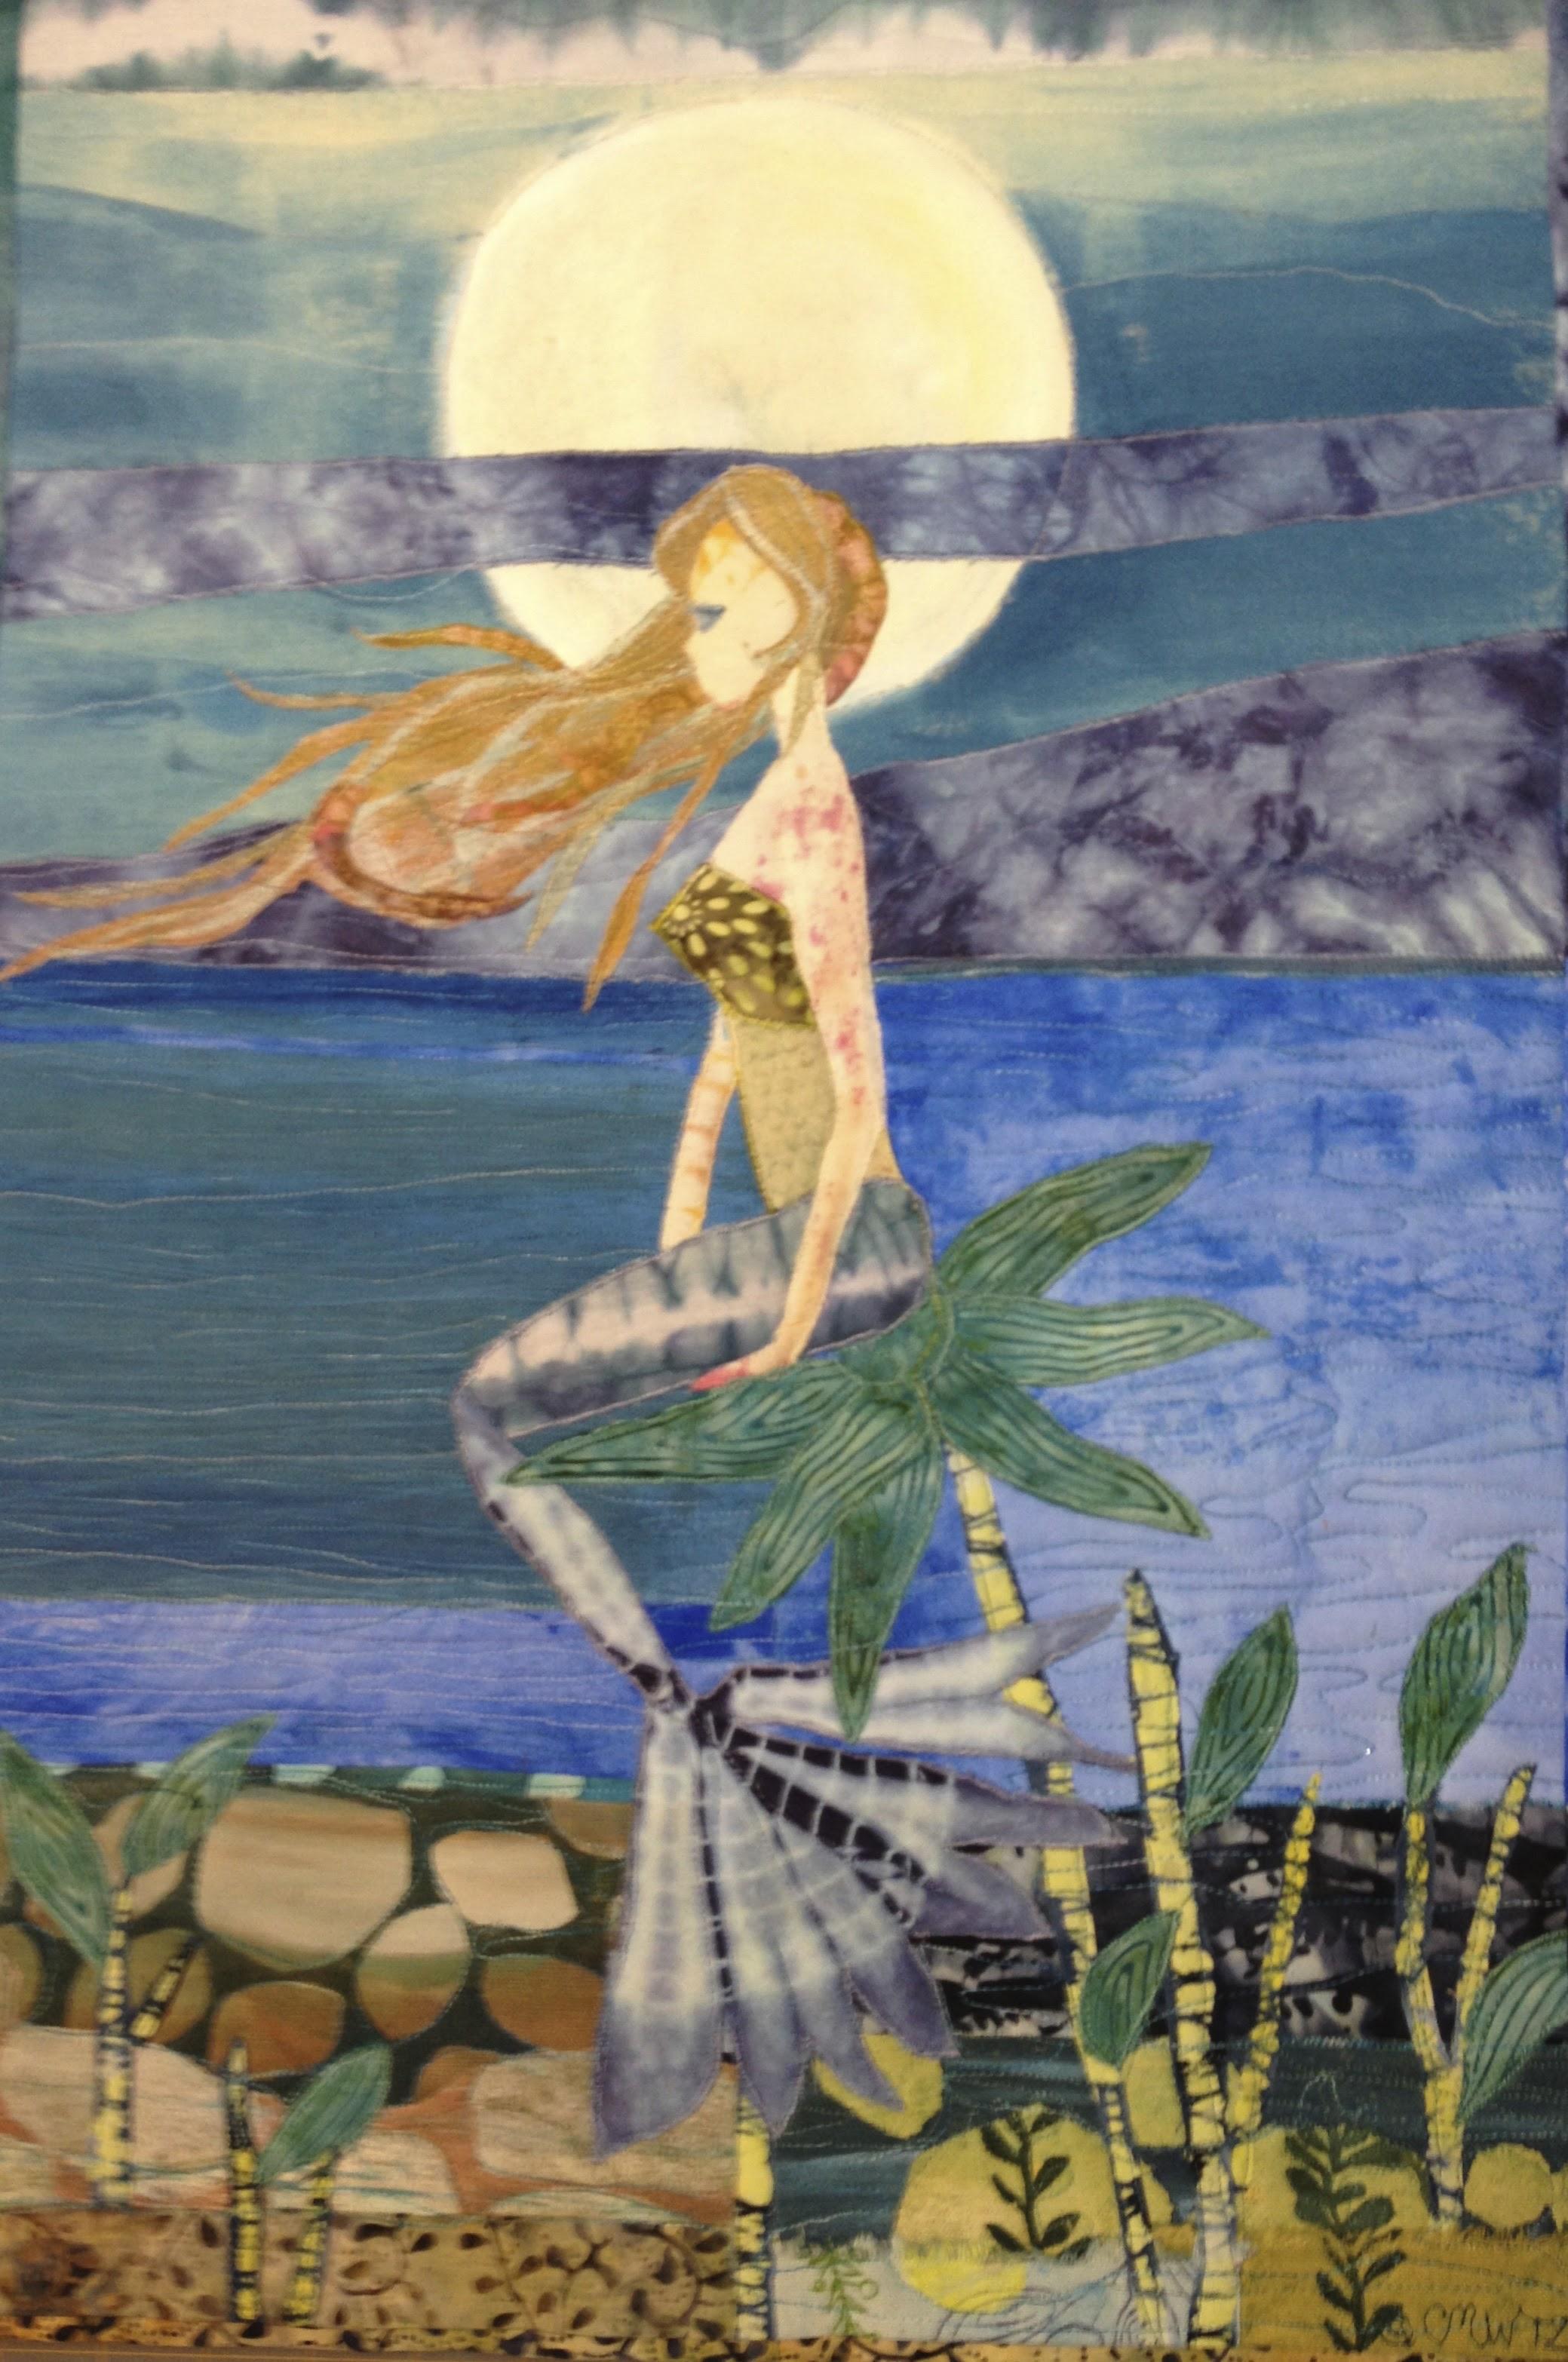 Mermaid with Full Moon